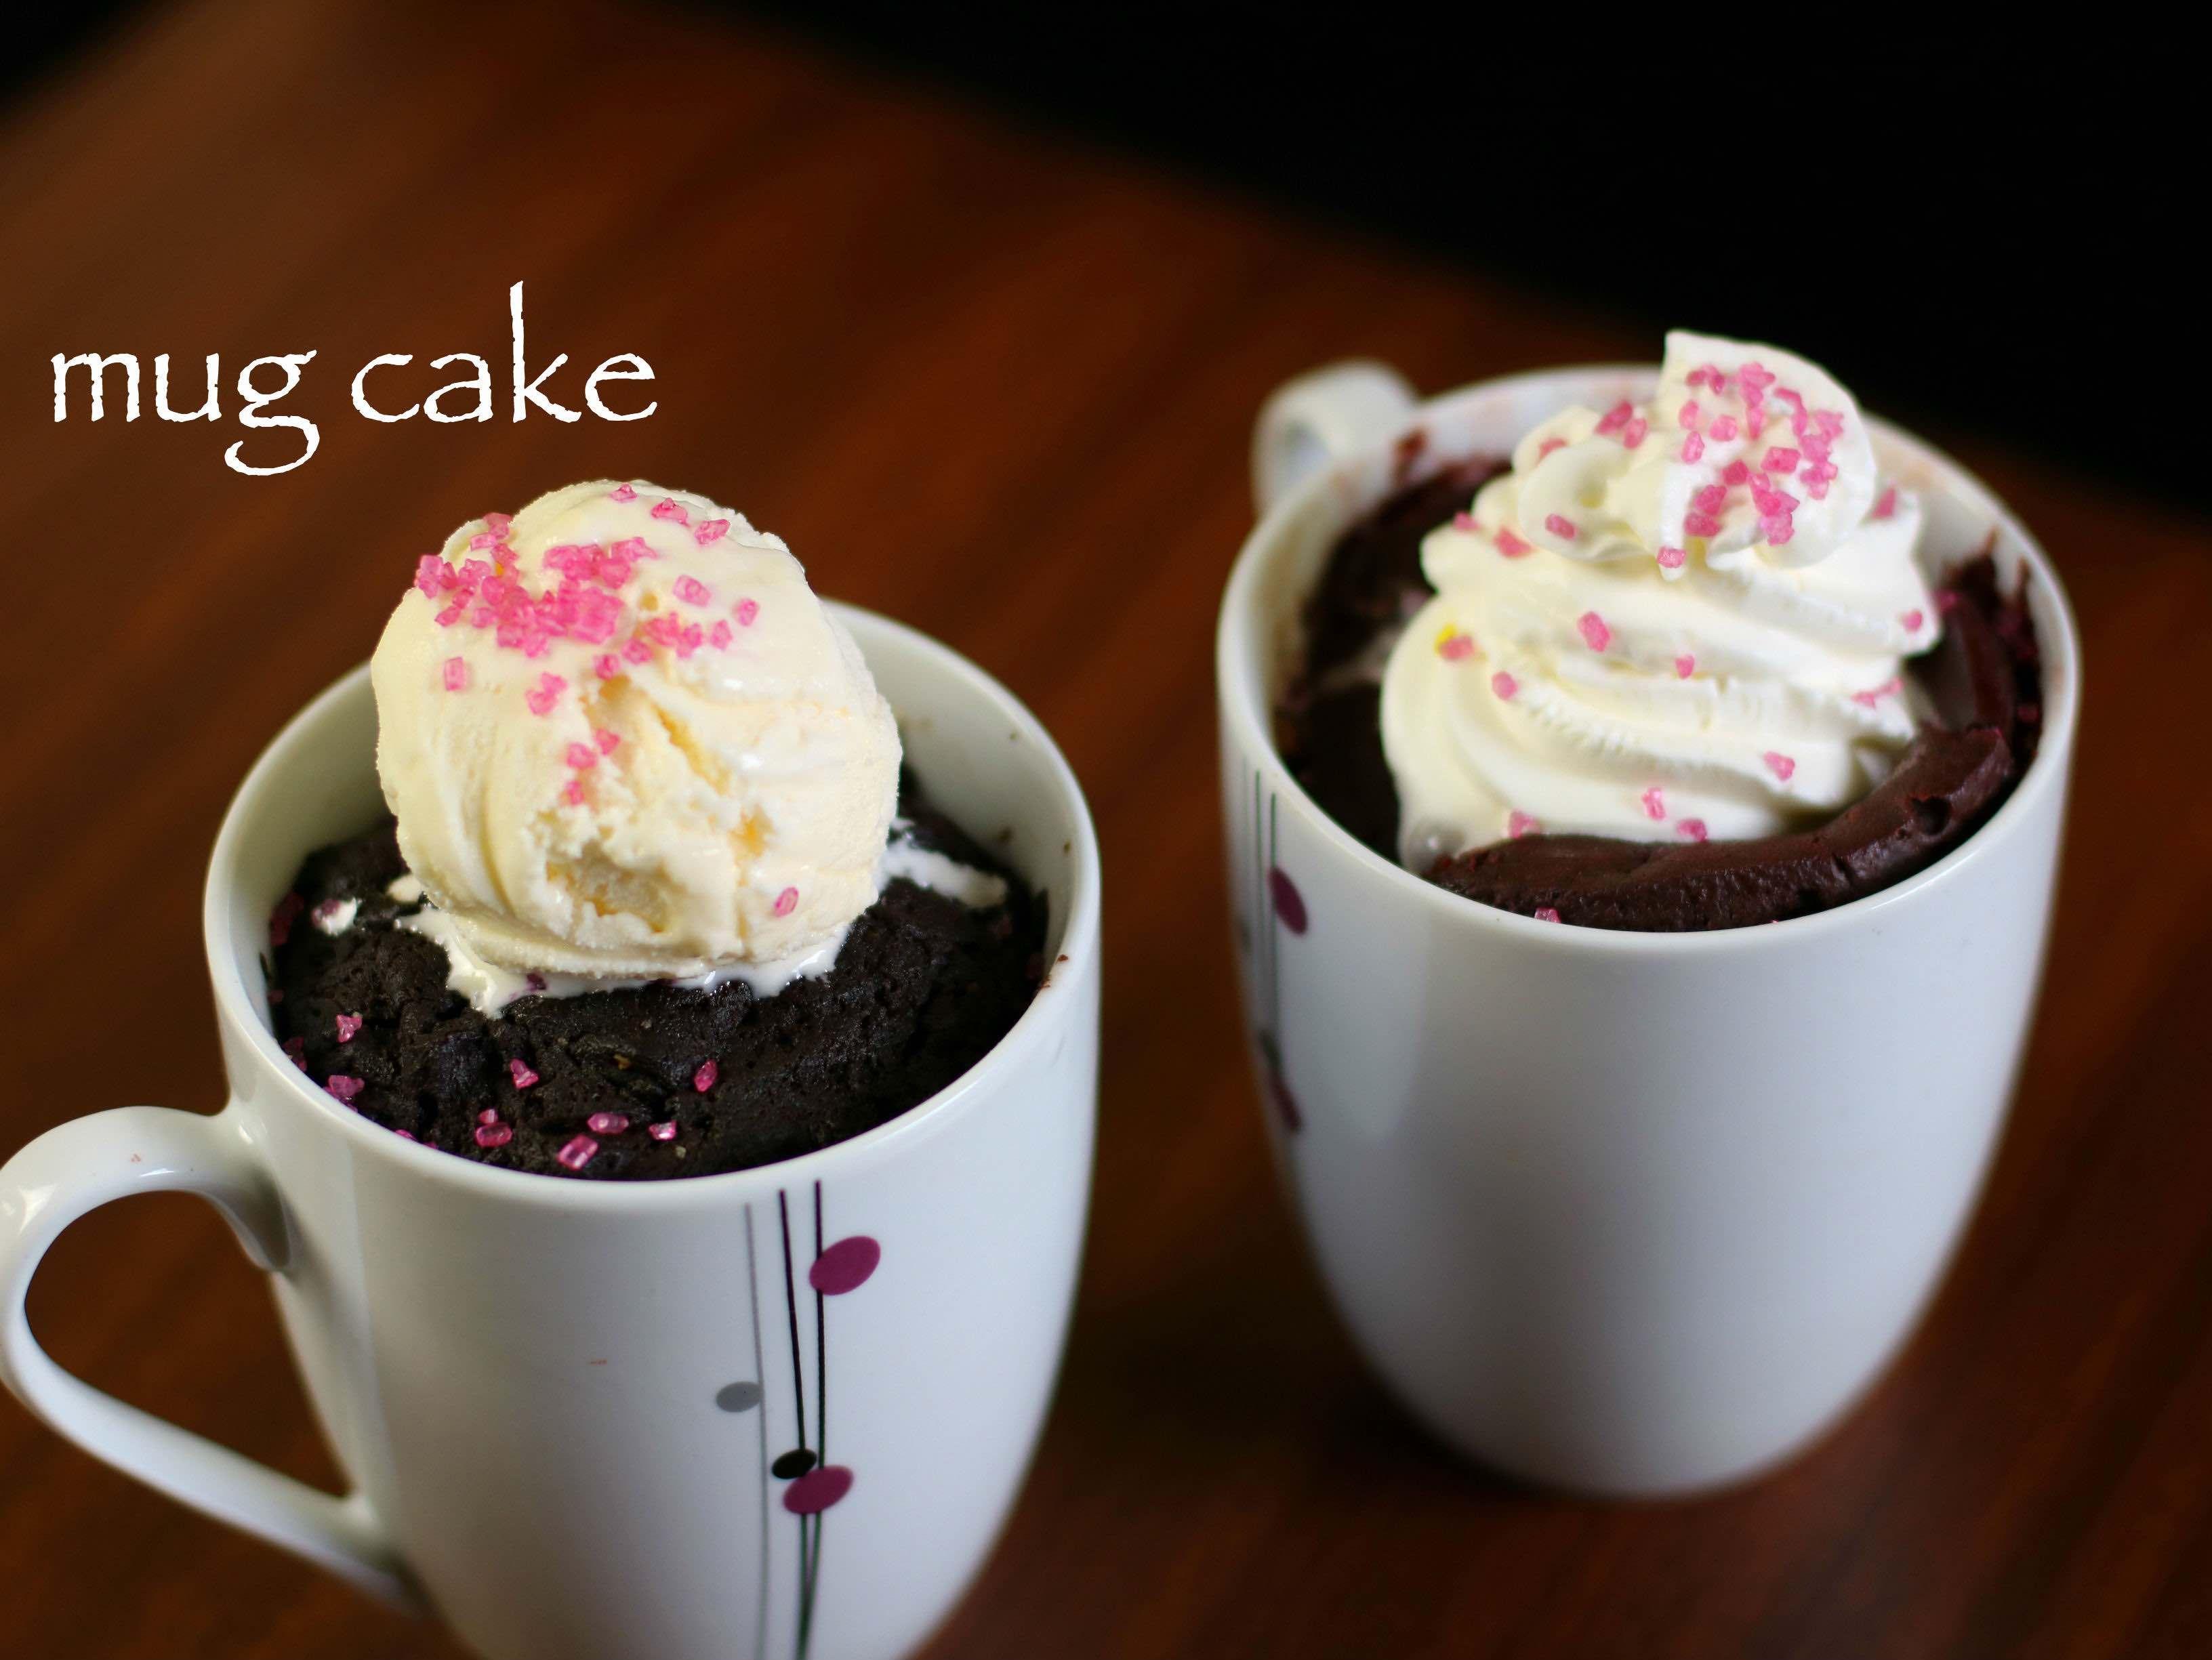 Mug Cake Microwave Cake Recipe Eggless Brownie Red Velvet Cake Recipe Mug Cake Microwave Microwave Cake Pear And Almond Cake